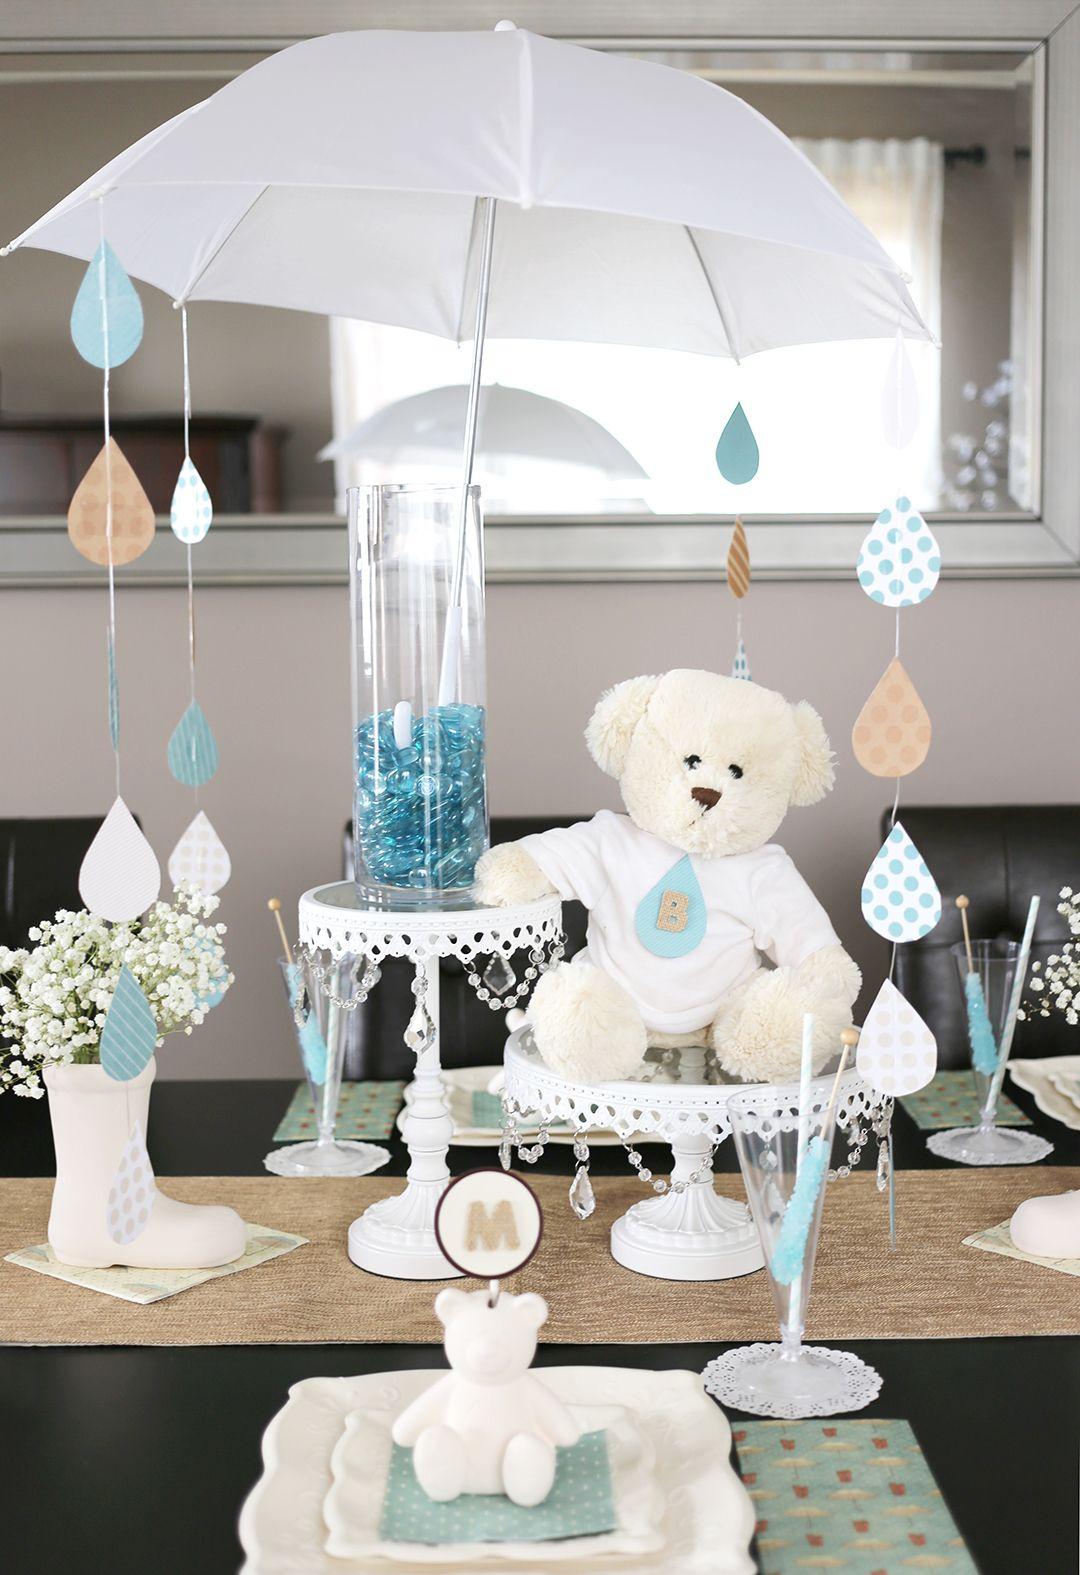 Raindrop Umbrella Baby Shower Centerpiece Project Baby Showers